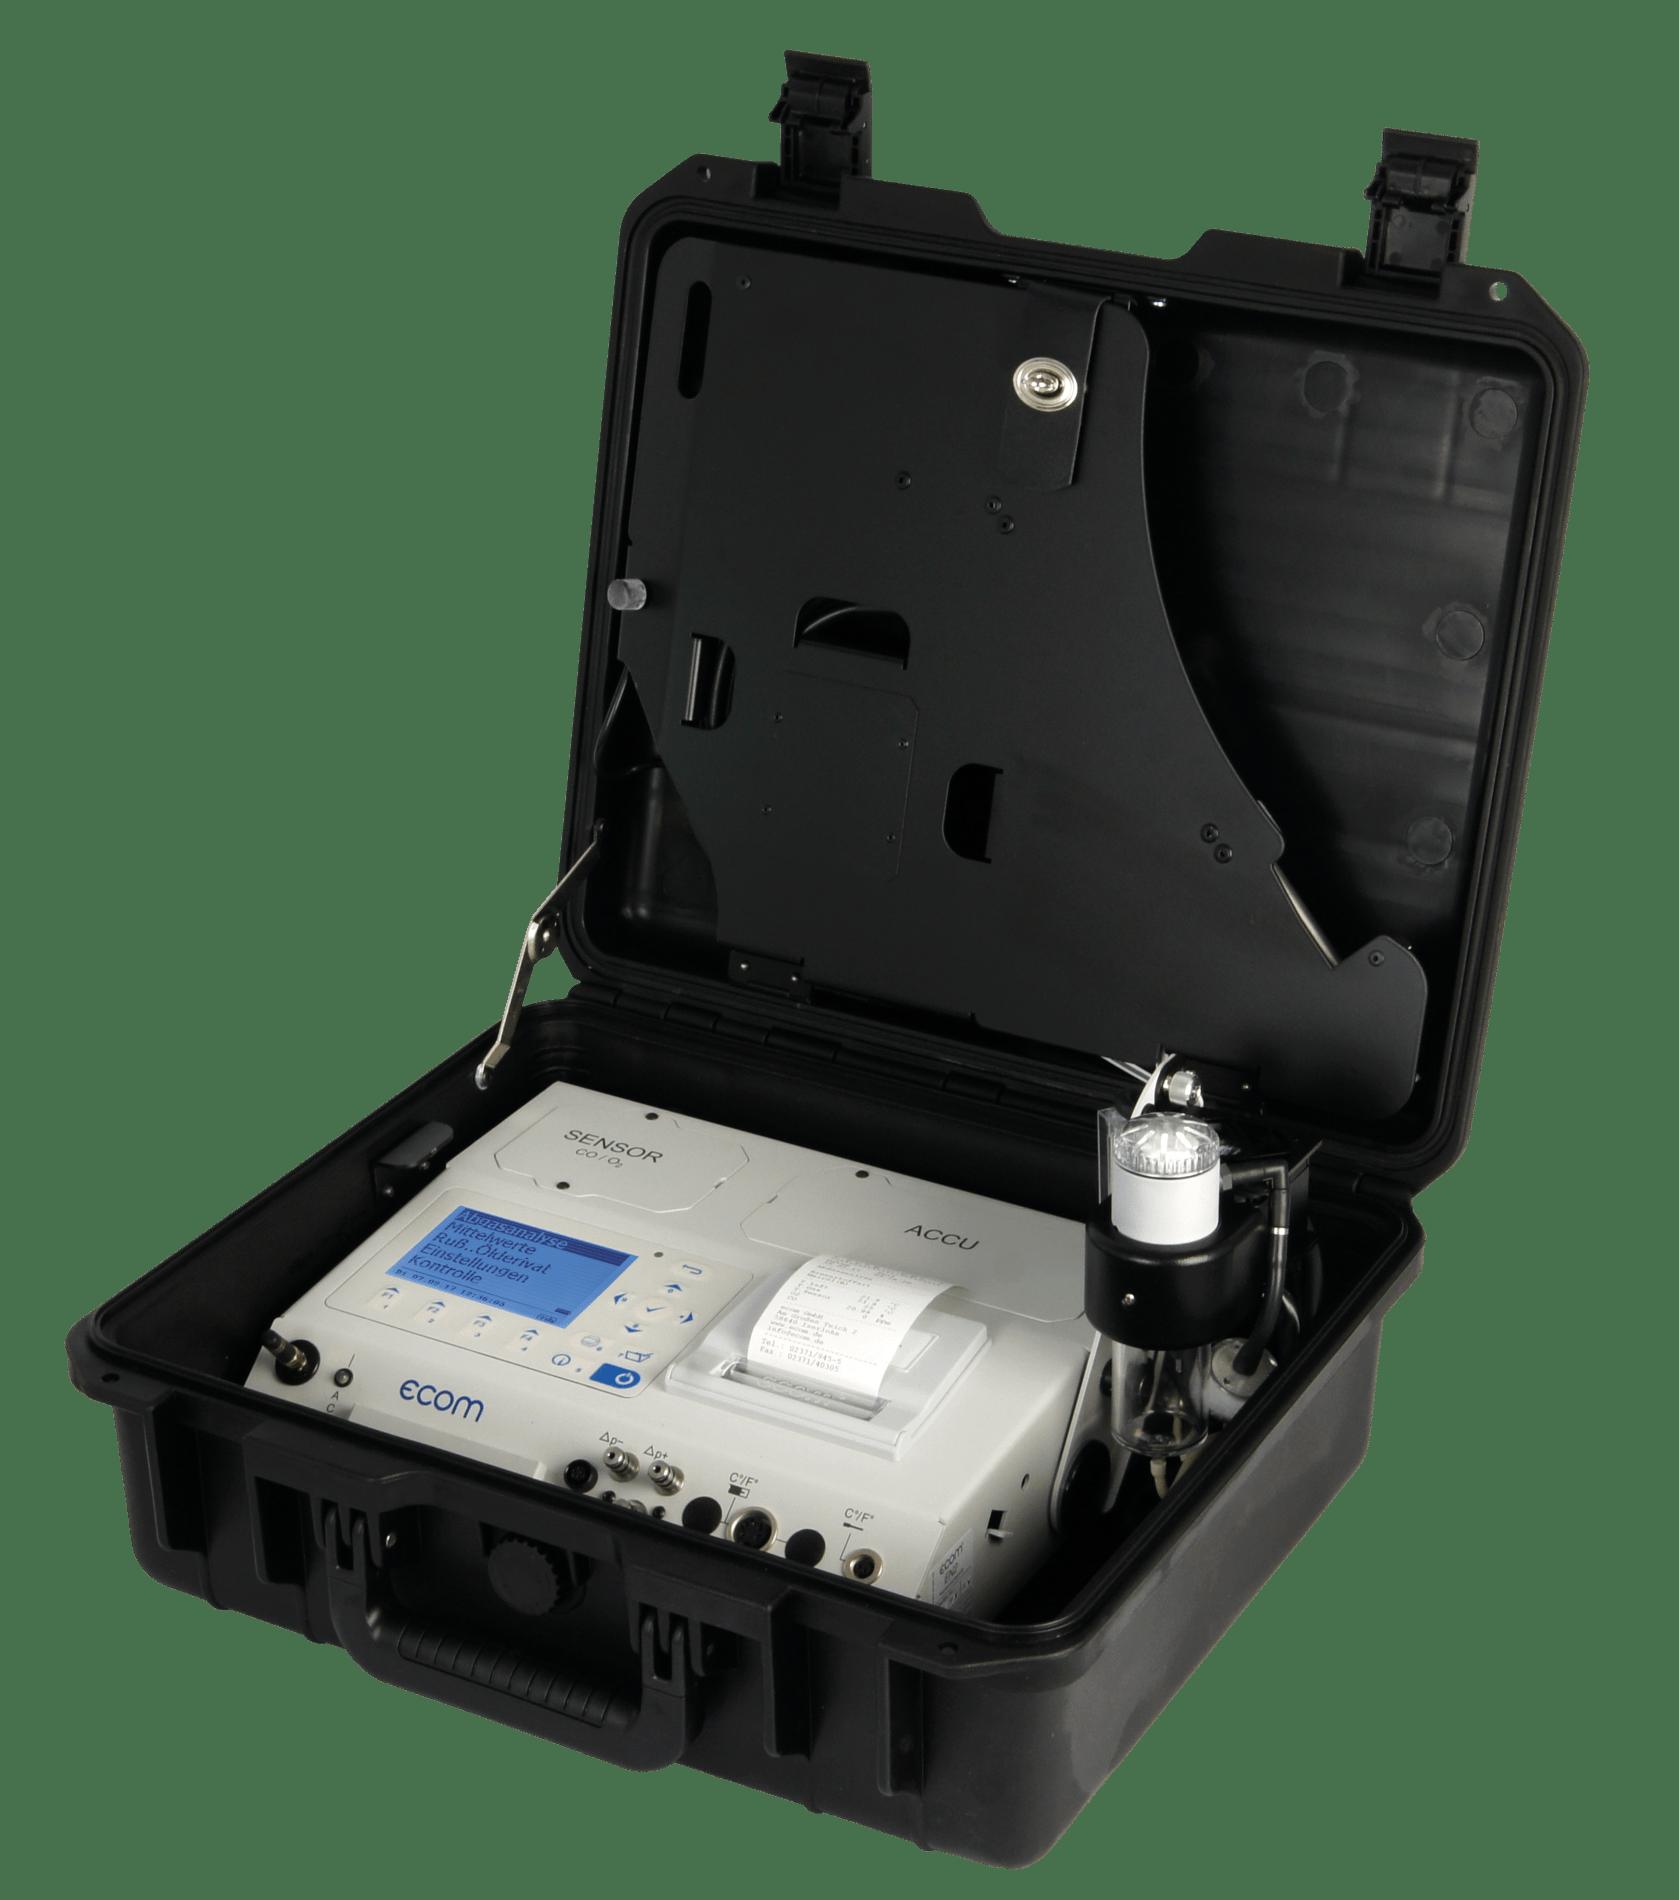 ecom-EN2-F - Abgasanalysegerät für industrielle Anwendungen in Fluggepäckform